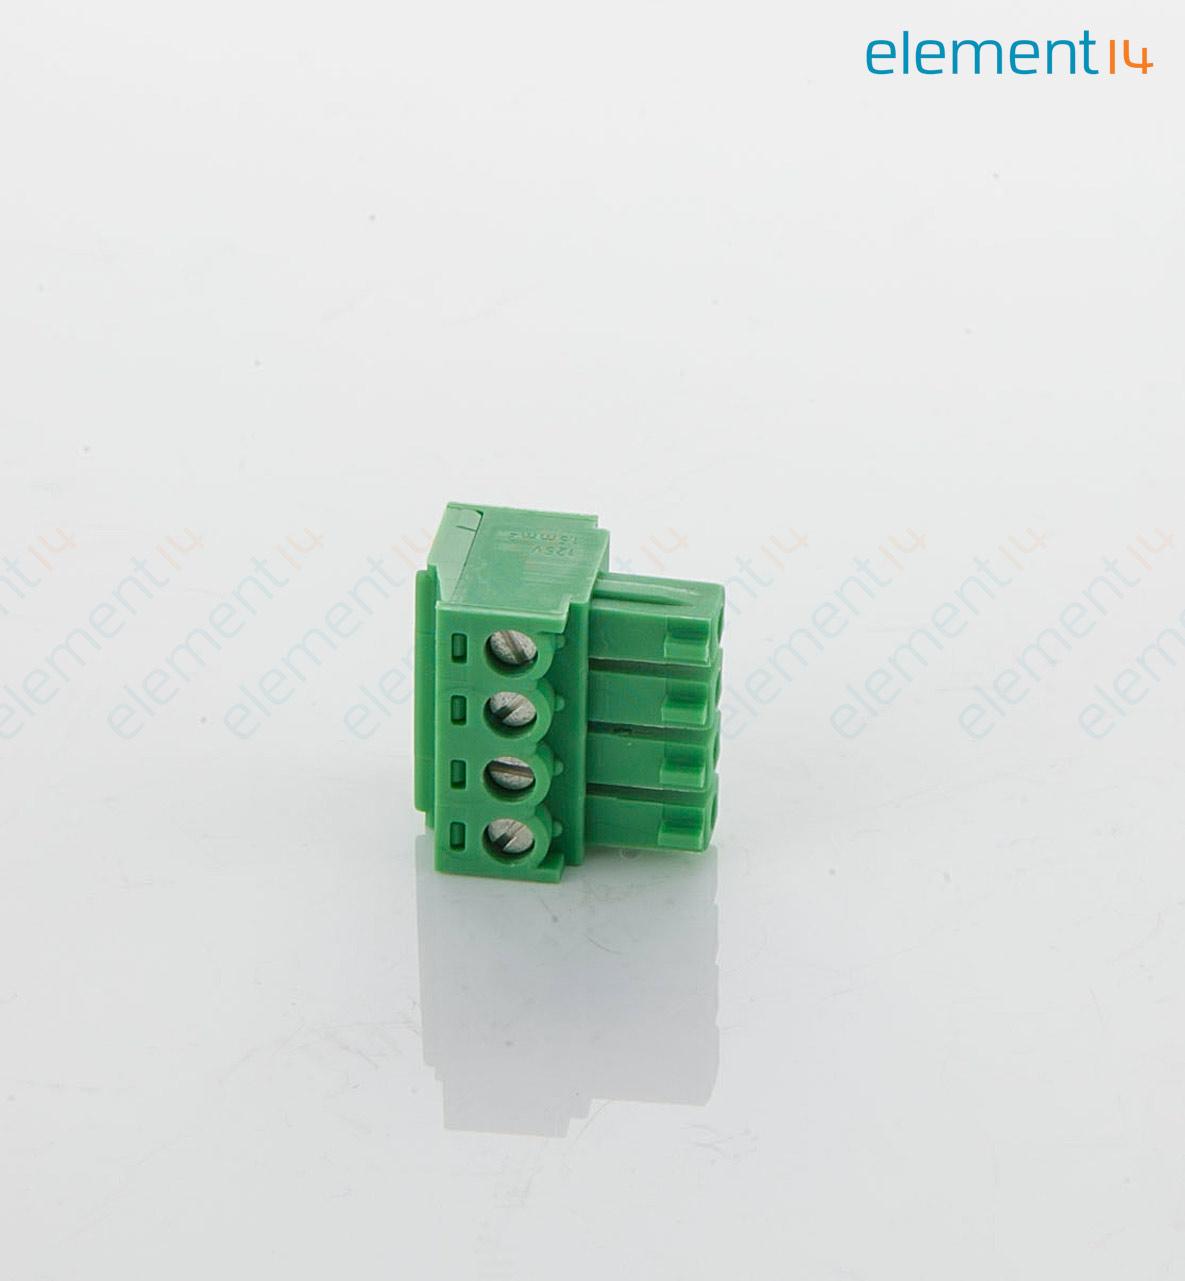 1803594 PHOENIX CONTACT, Steckbare Reihenklemme, 3.81 mm, 4 -polig